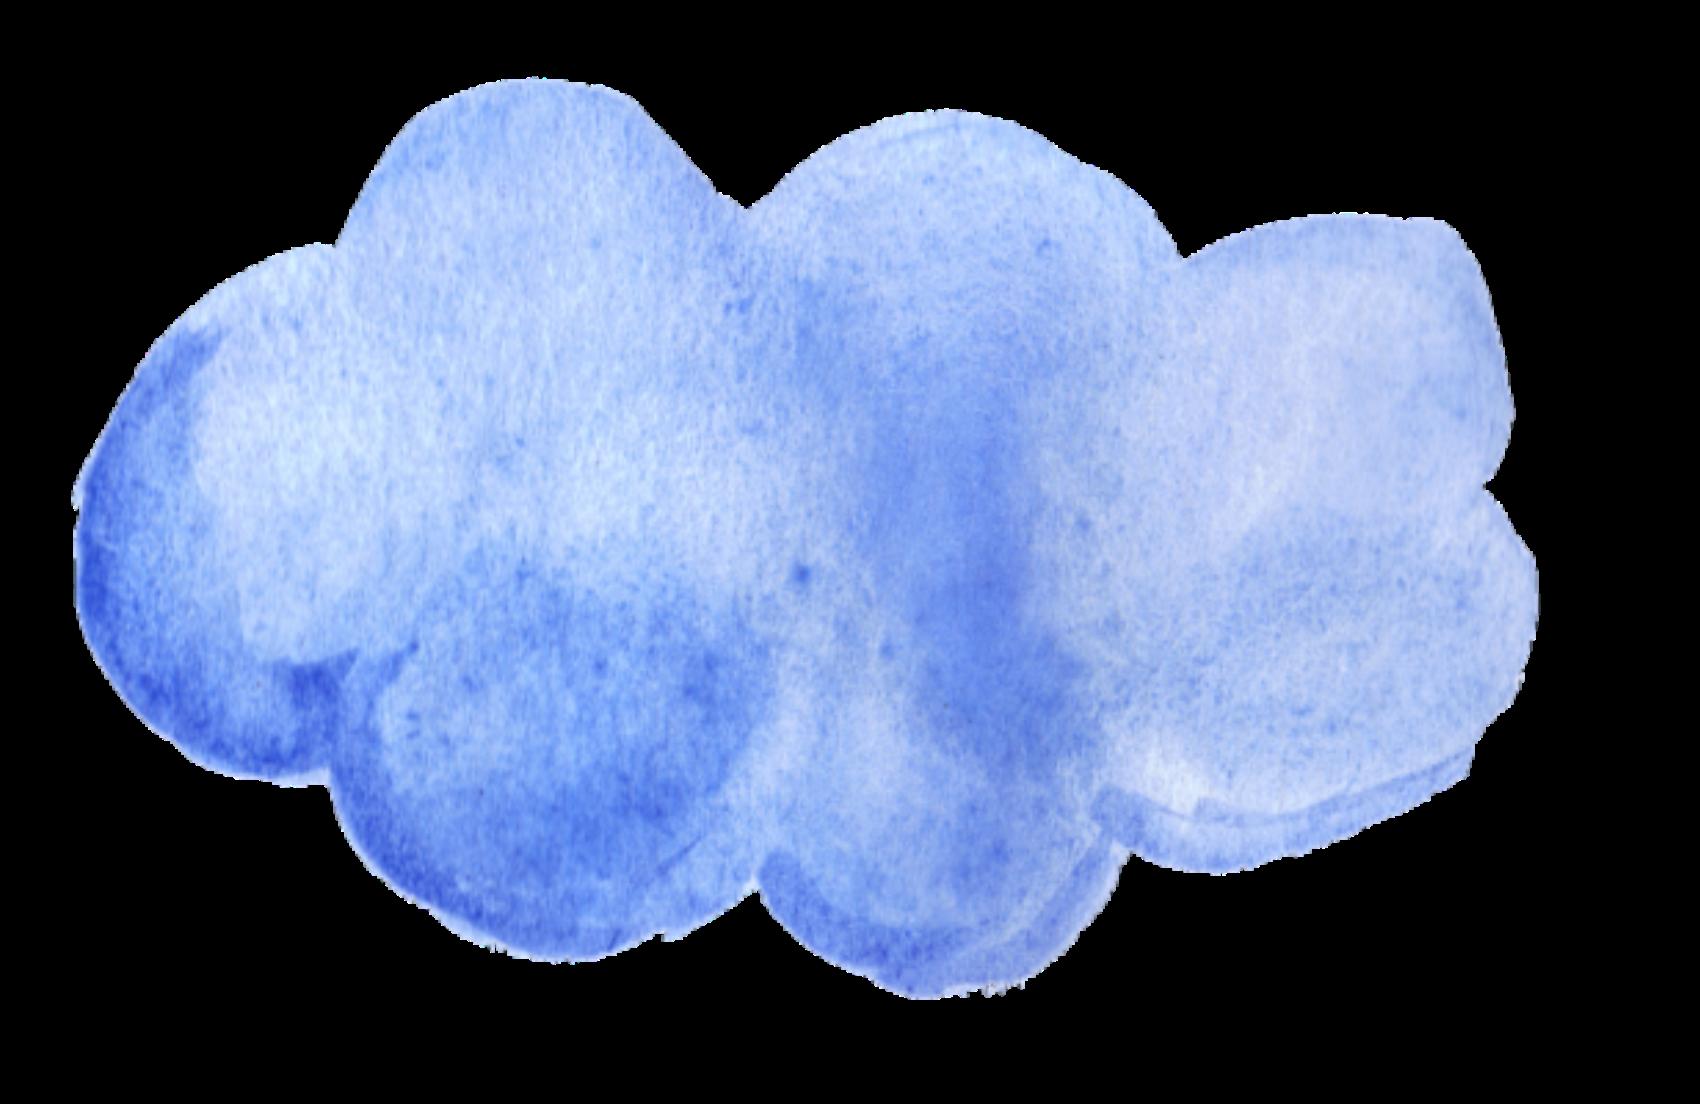 Splash Blue Watercolour Background